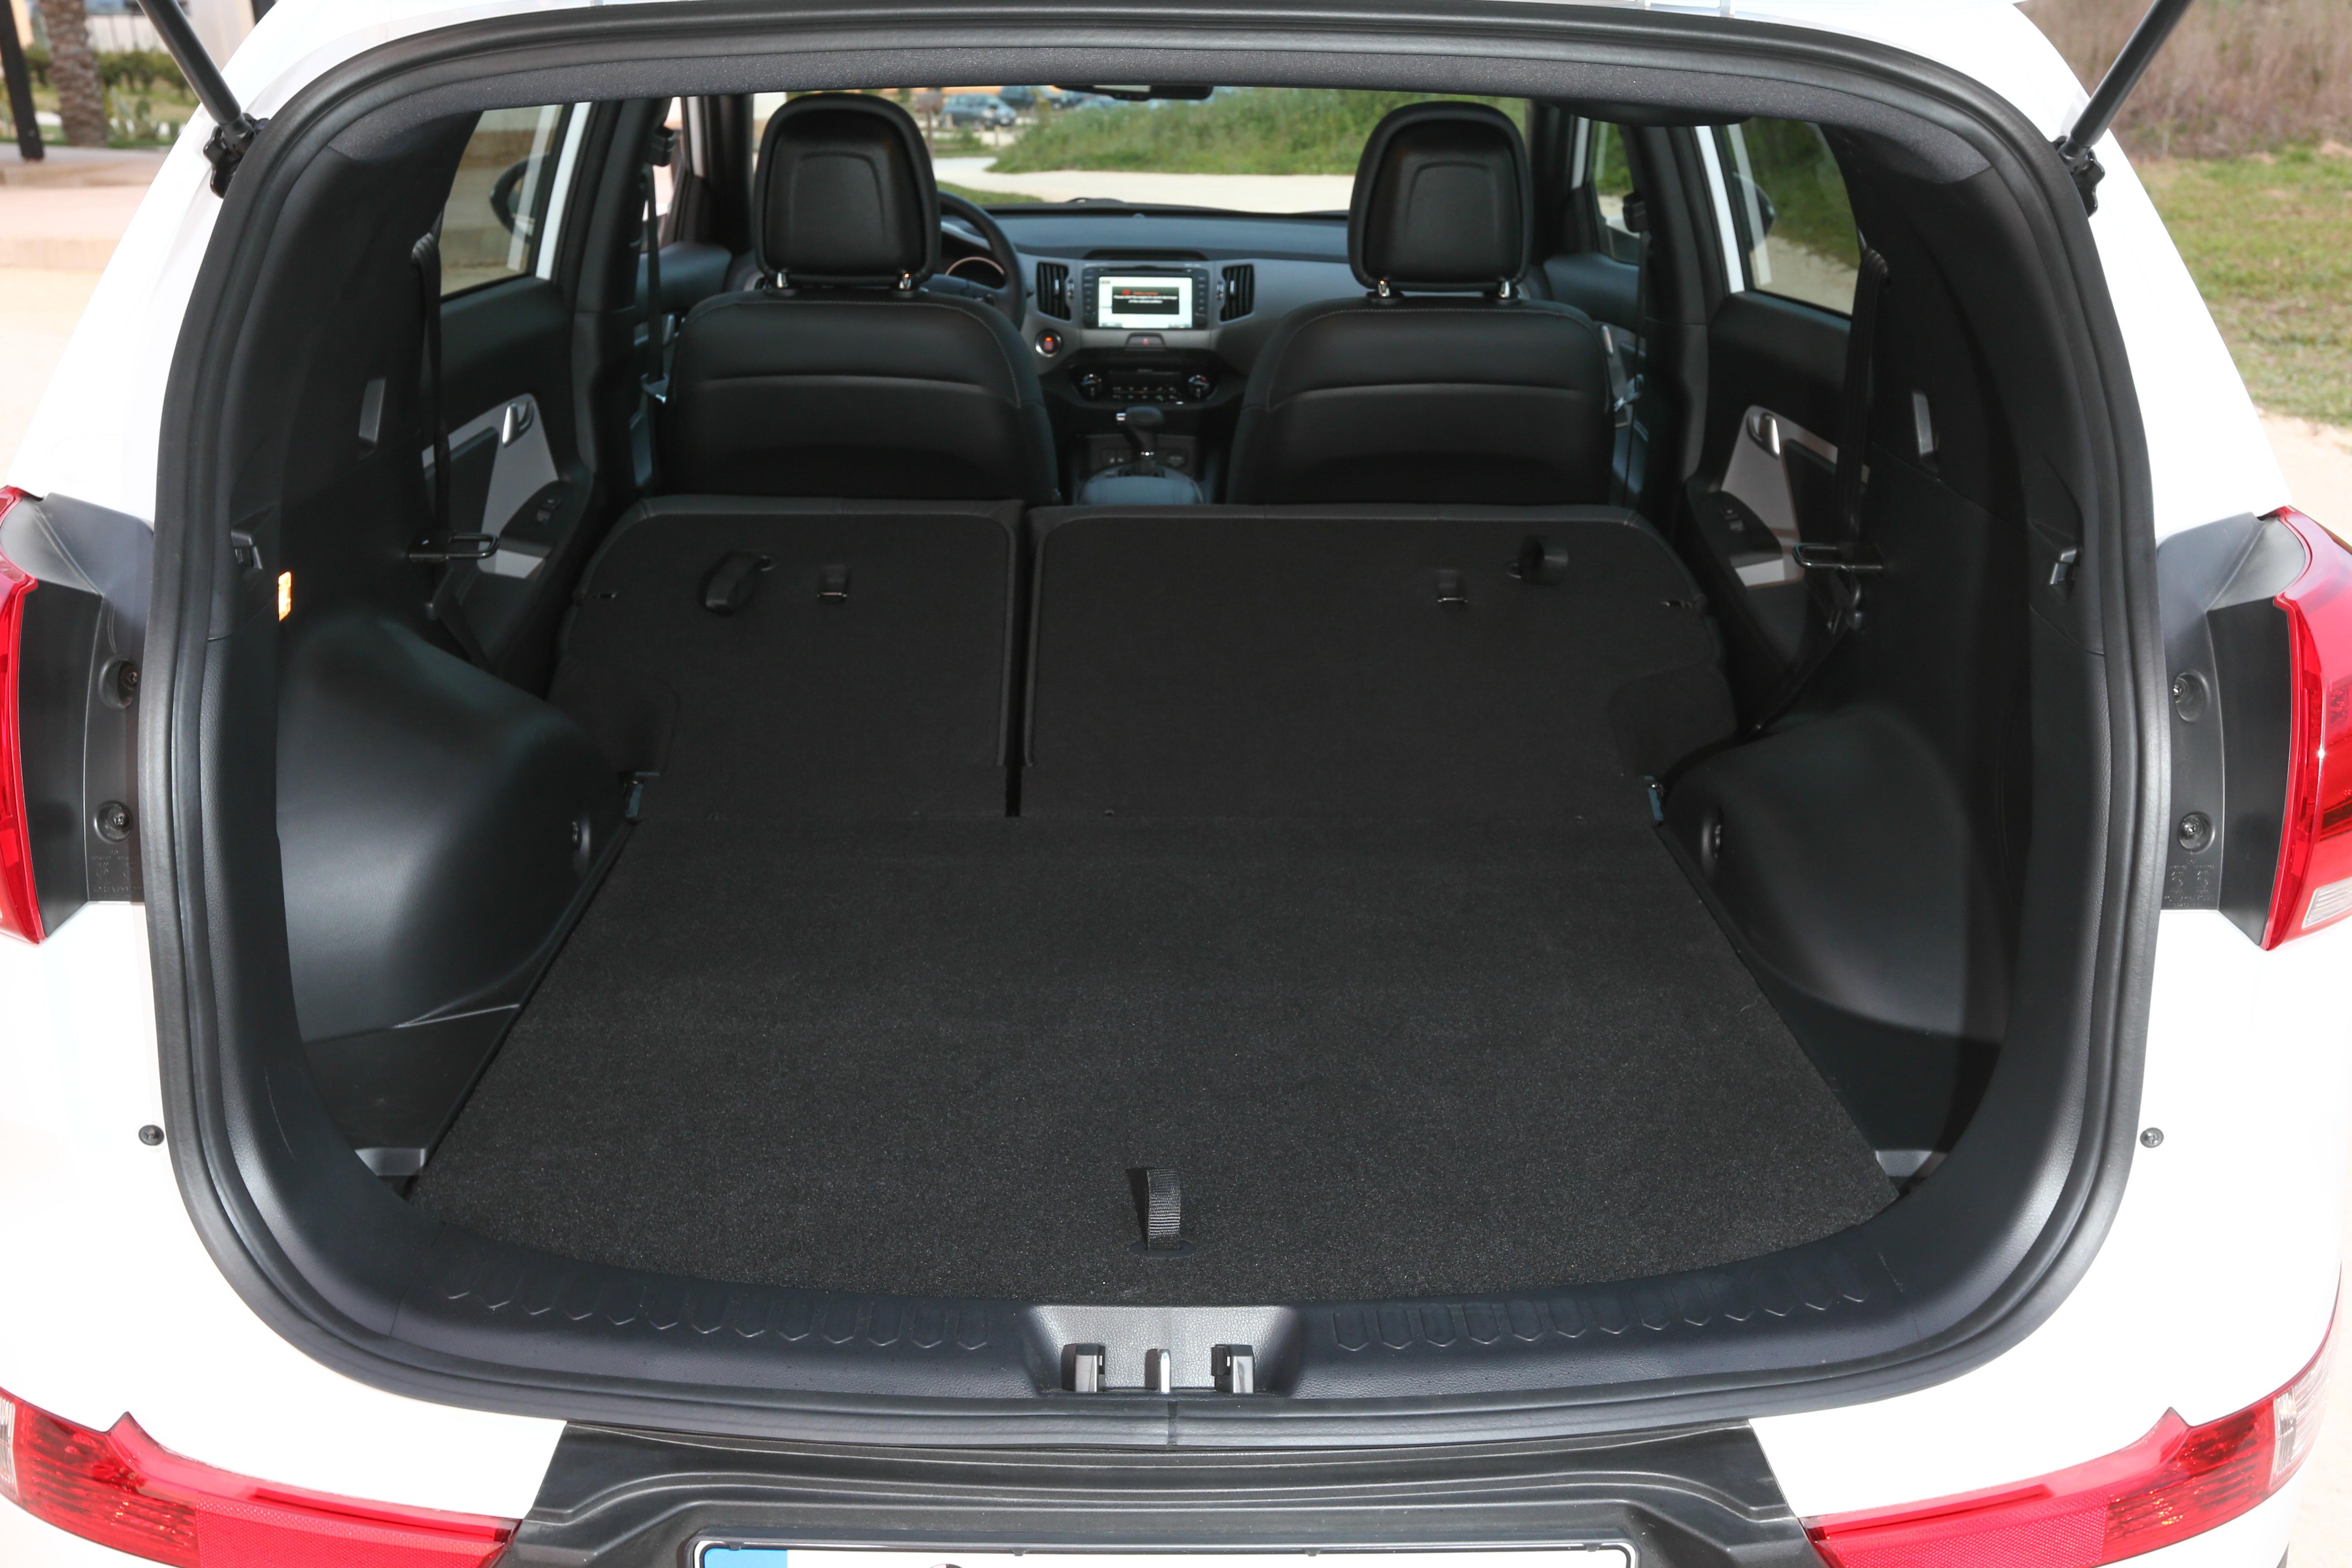 facelift version des kia sportage autoexklusiv dortmund. Black Bedroom Furniture Sets. Home Design Ideas